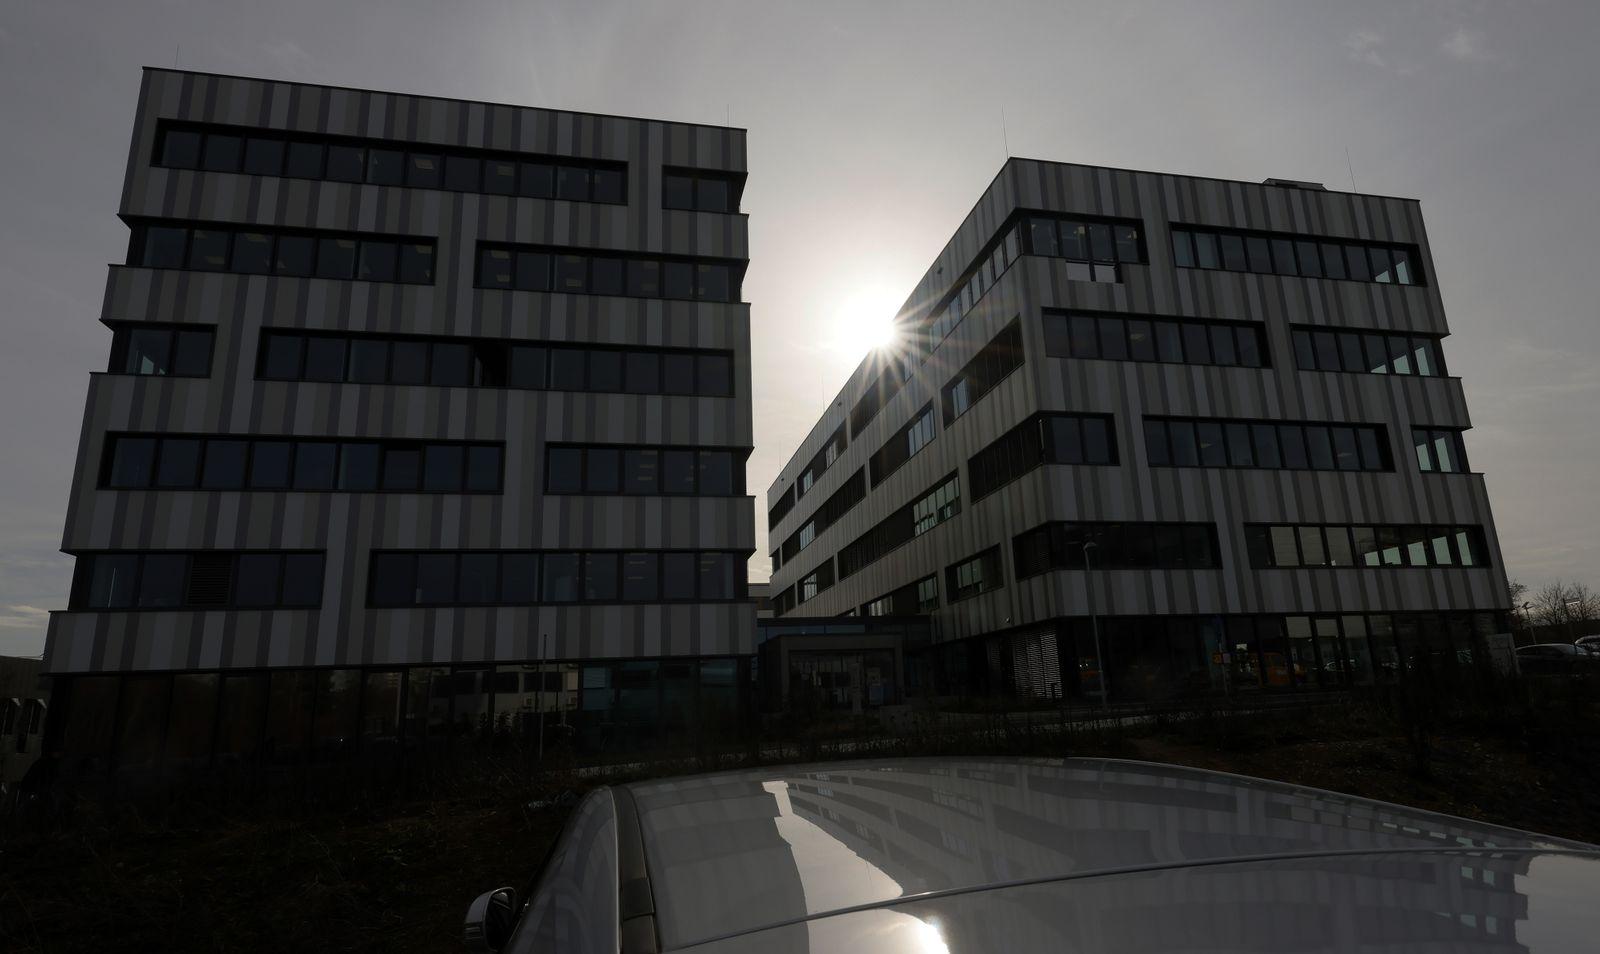 Vaccine company CureVac in Tuebingen, Germany - 04 Feb 2021